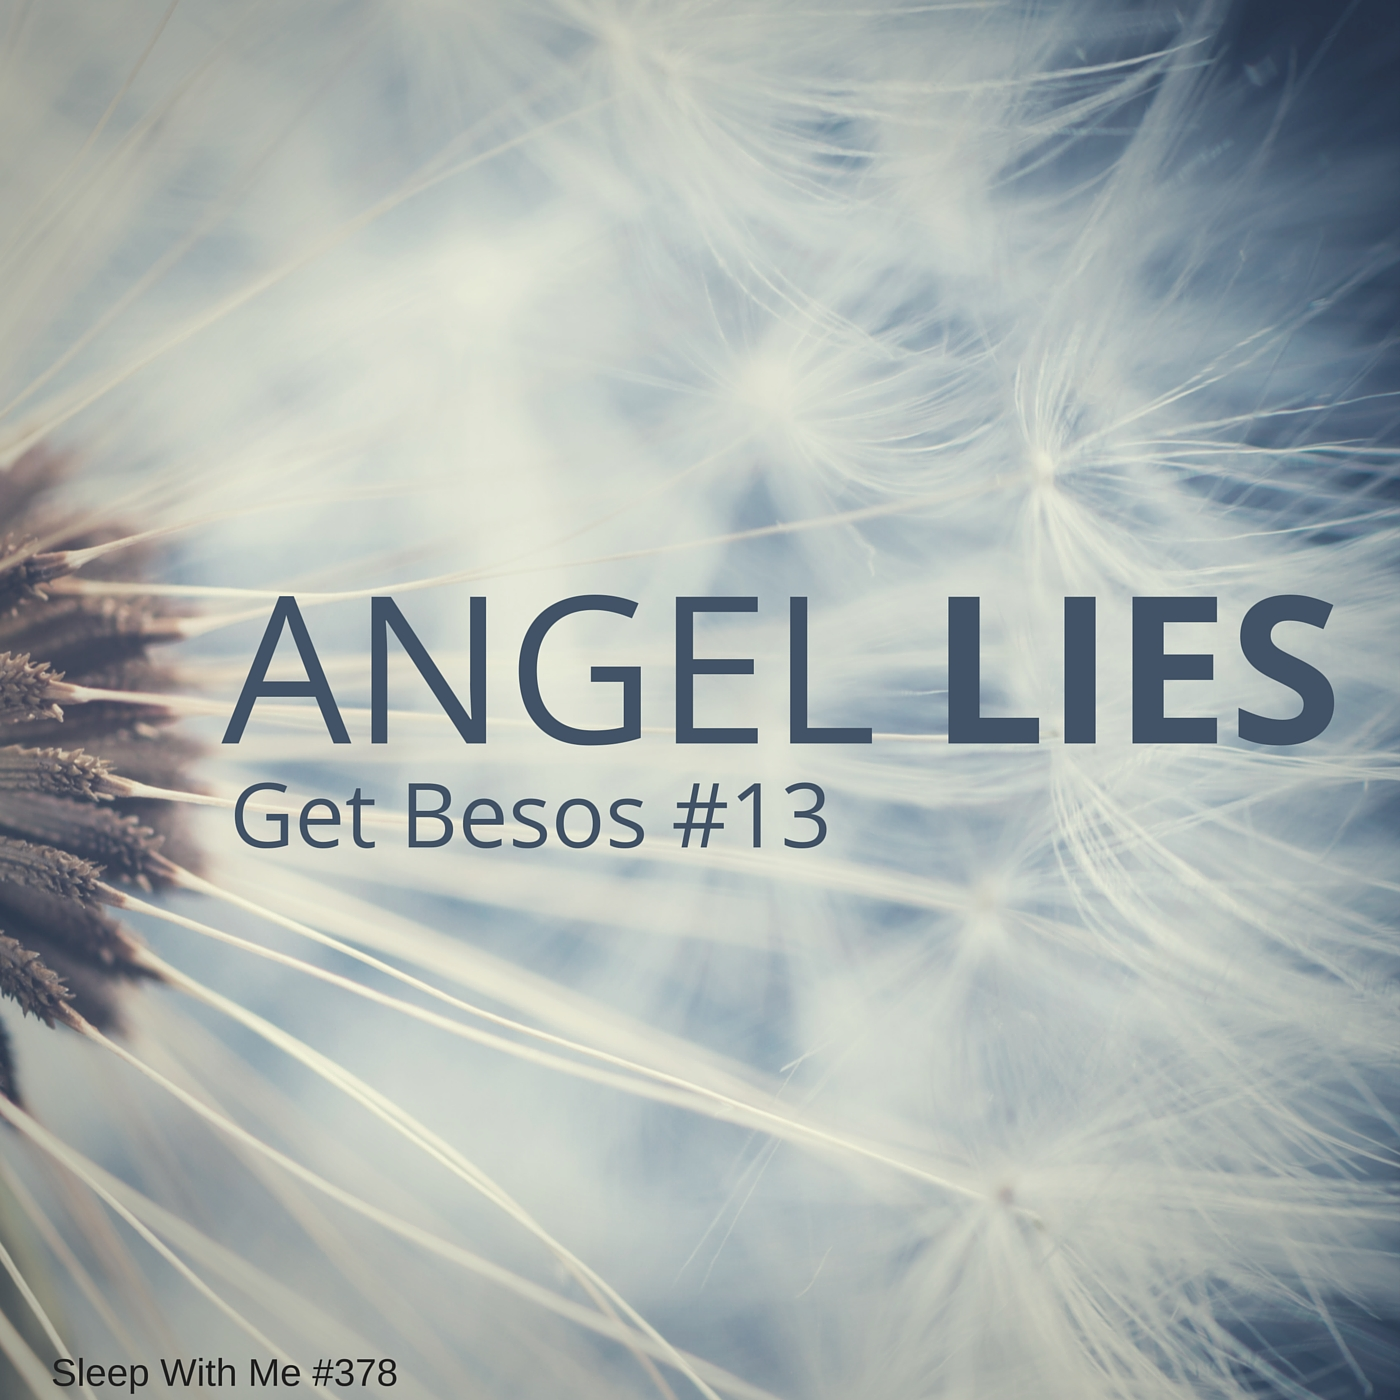 Angel Lies | Get Besos #13 | Sleep With Me #378